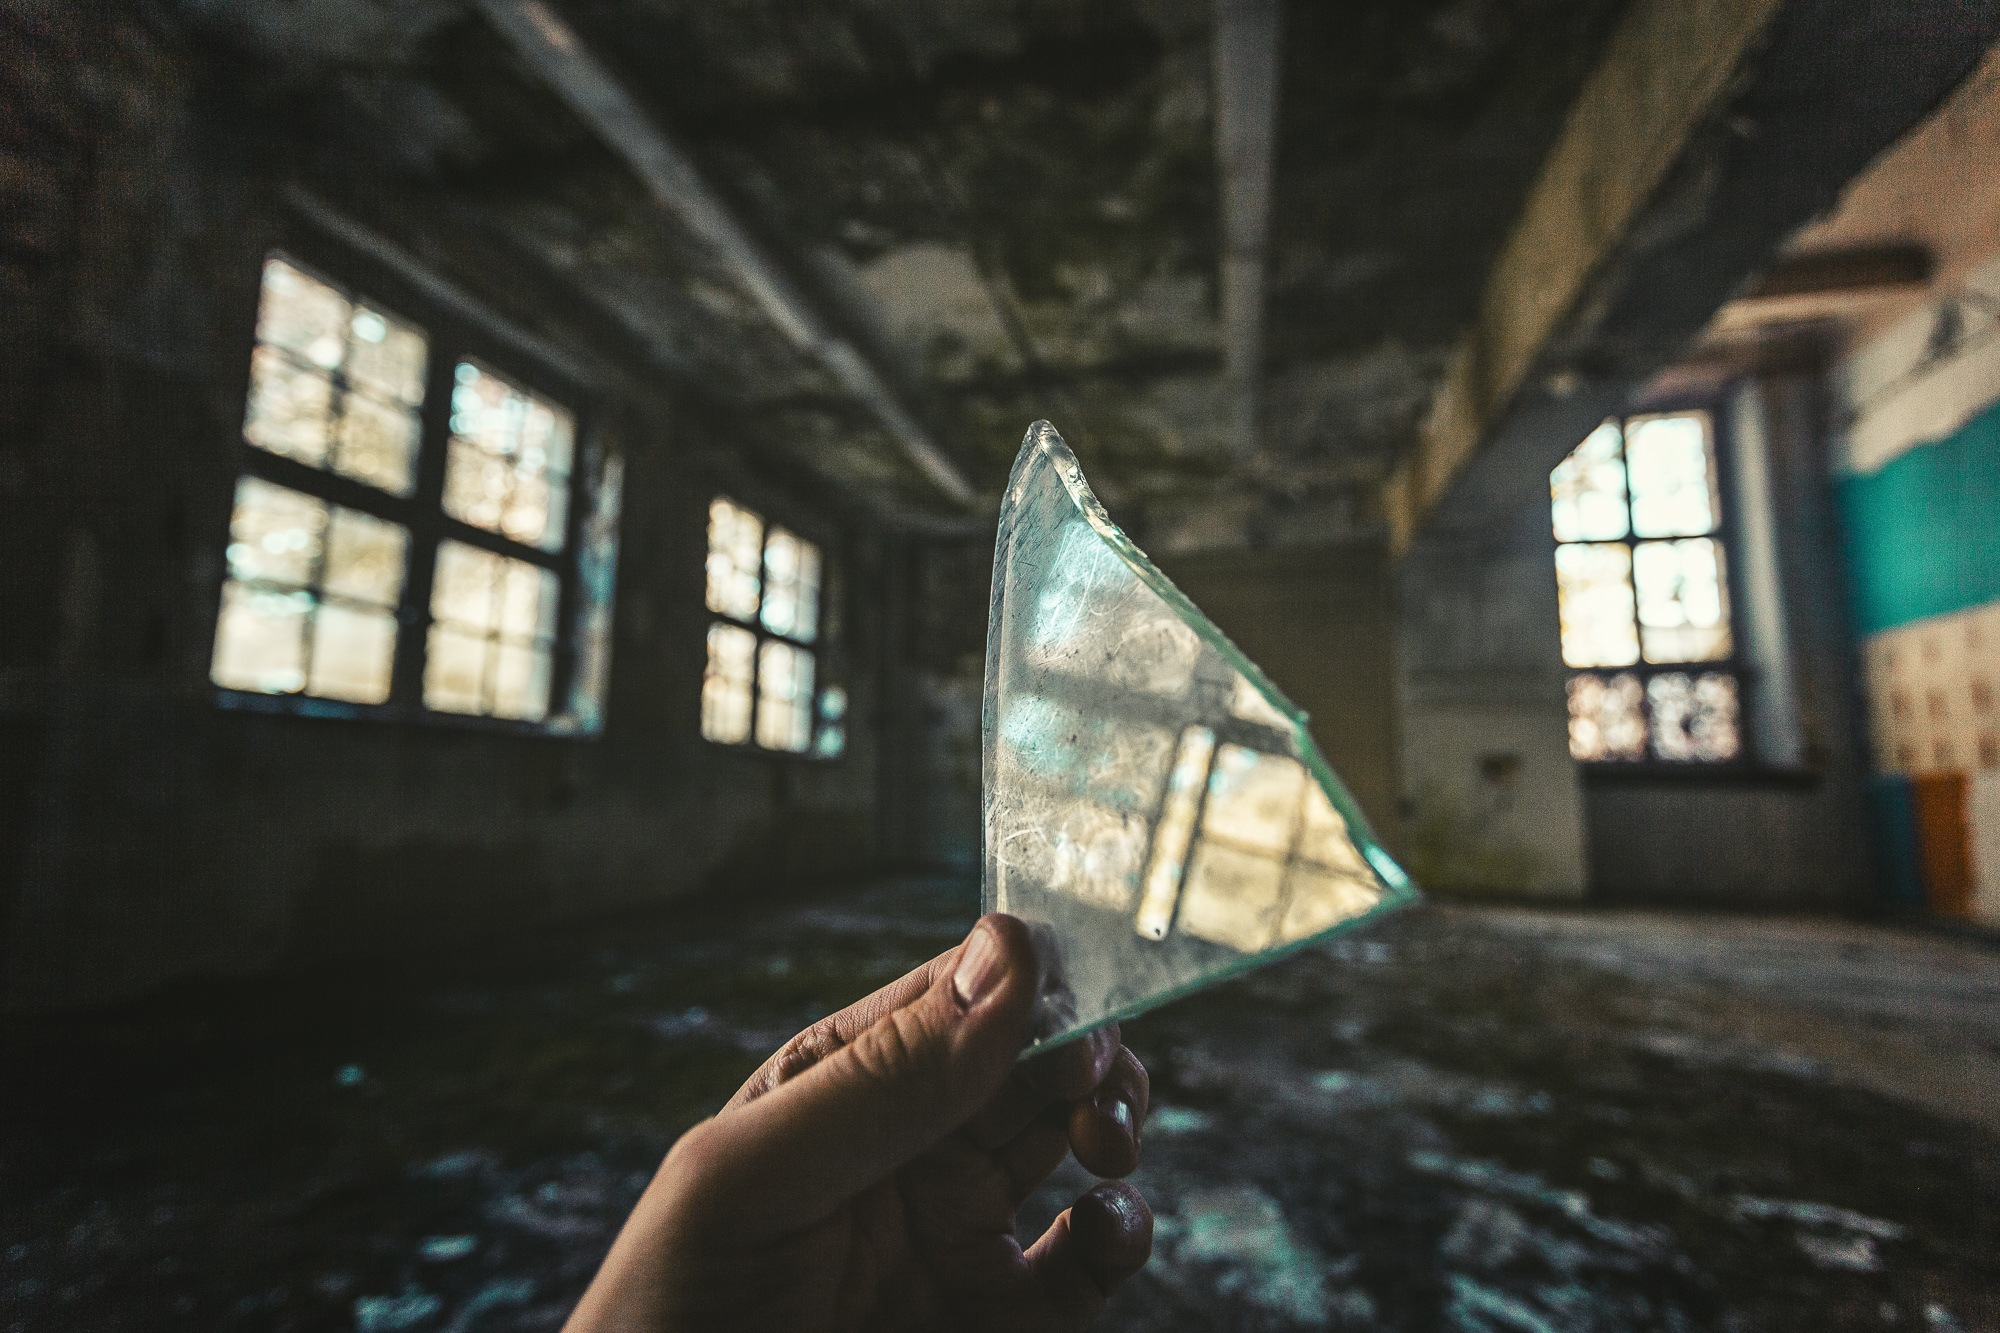 Glass by Jip van Bodegom